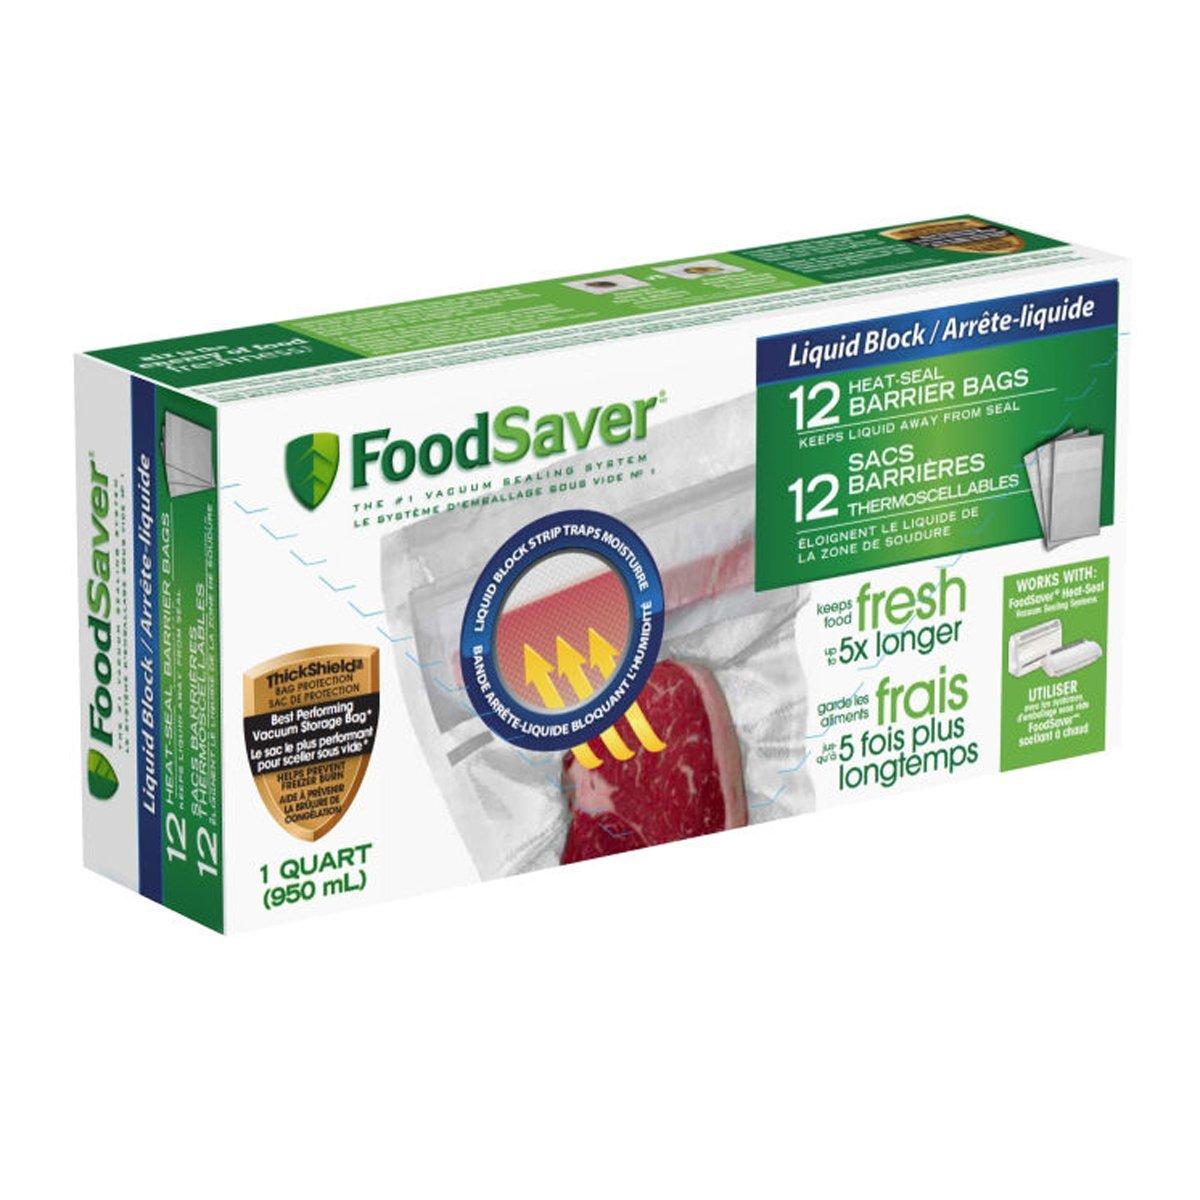 FoodSaver Liquid Block Quart Size Bags (12 Count) FSFSBFLB216-033